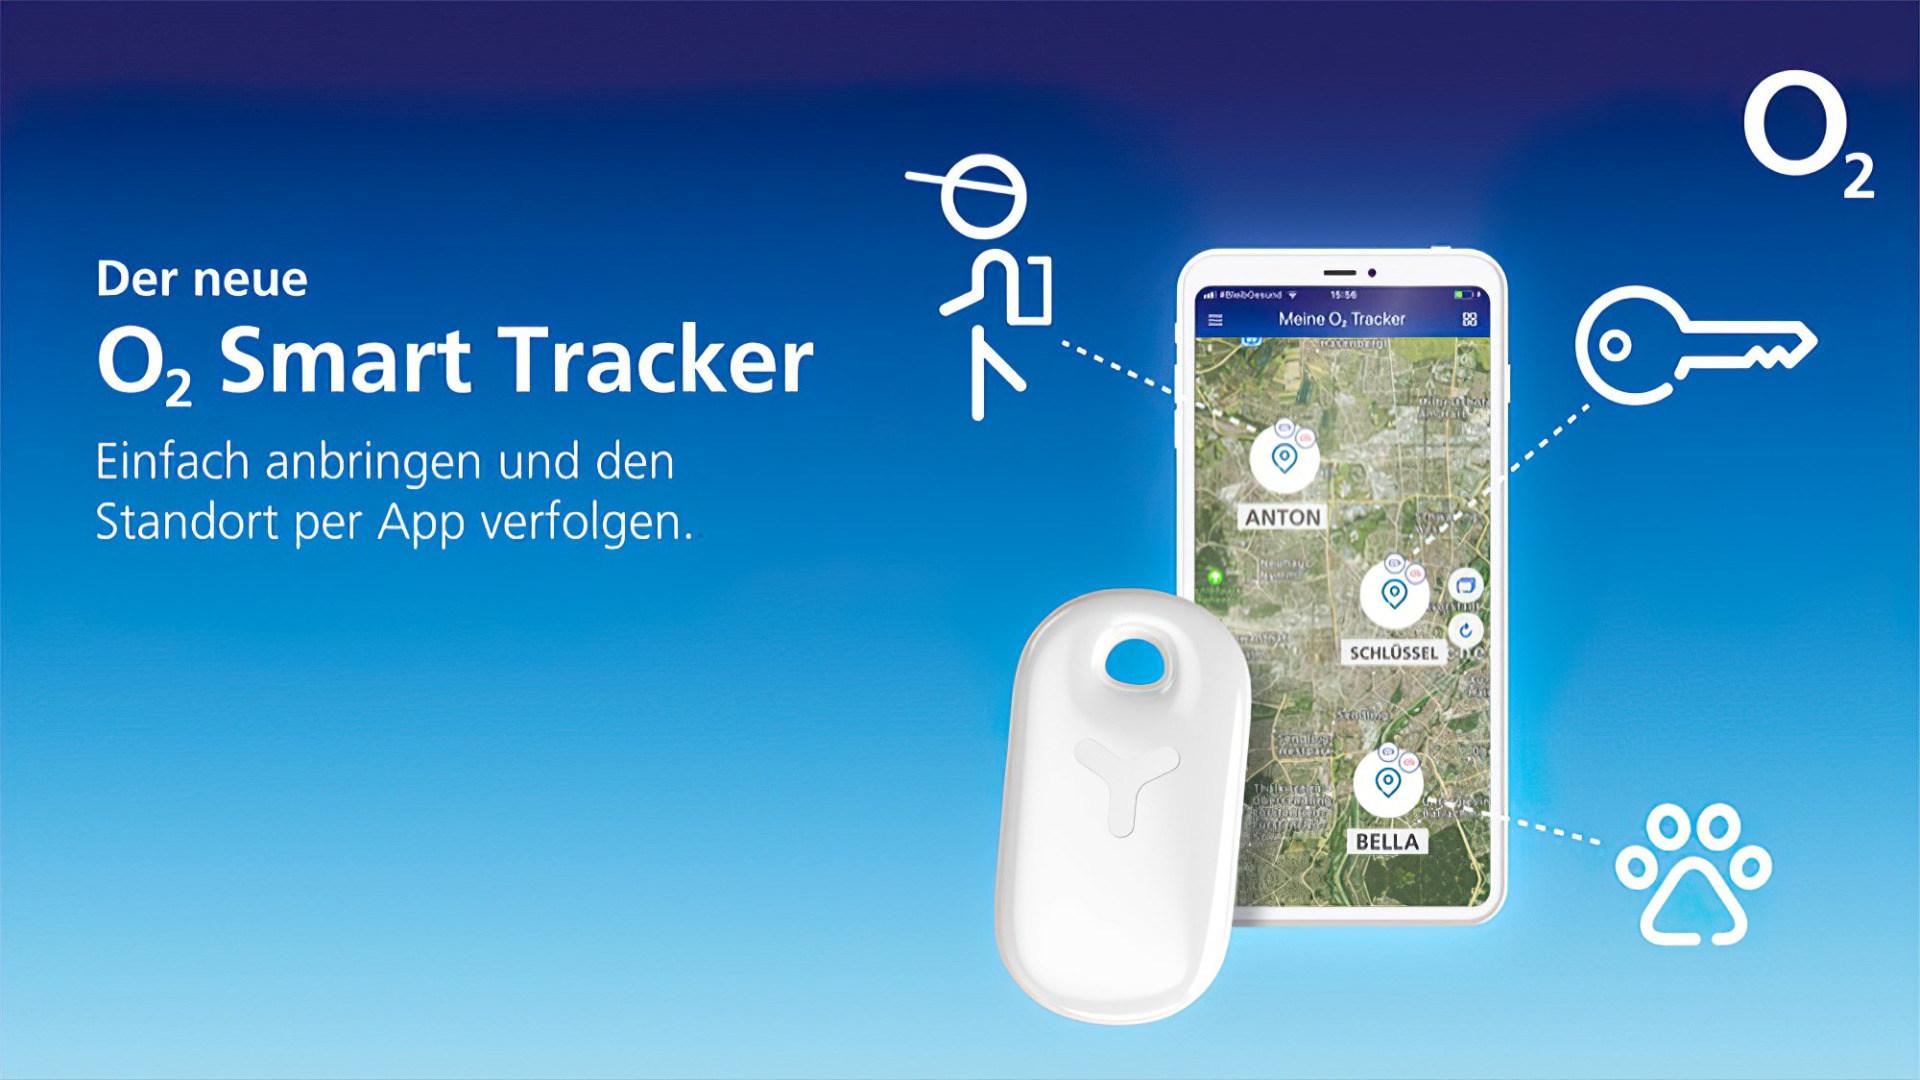 O2, Tracking, Gps, Standort, Smart Tracker